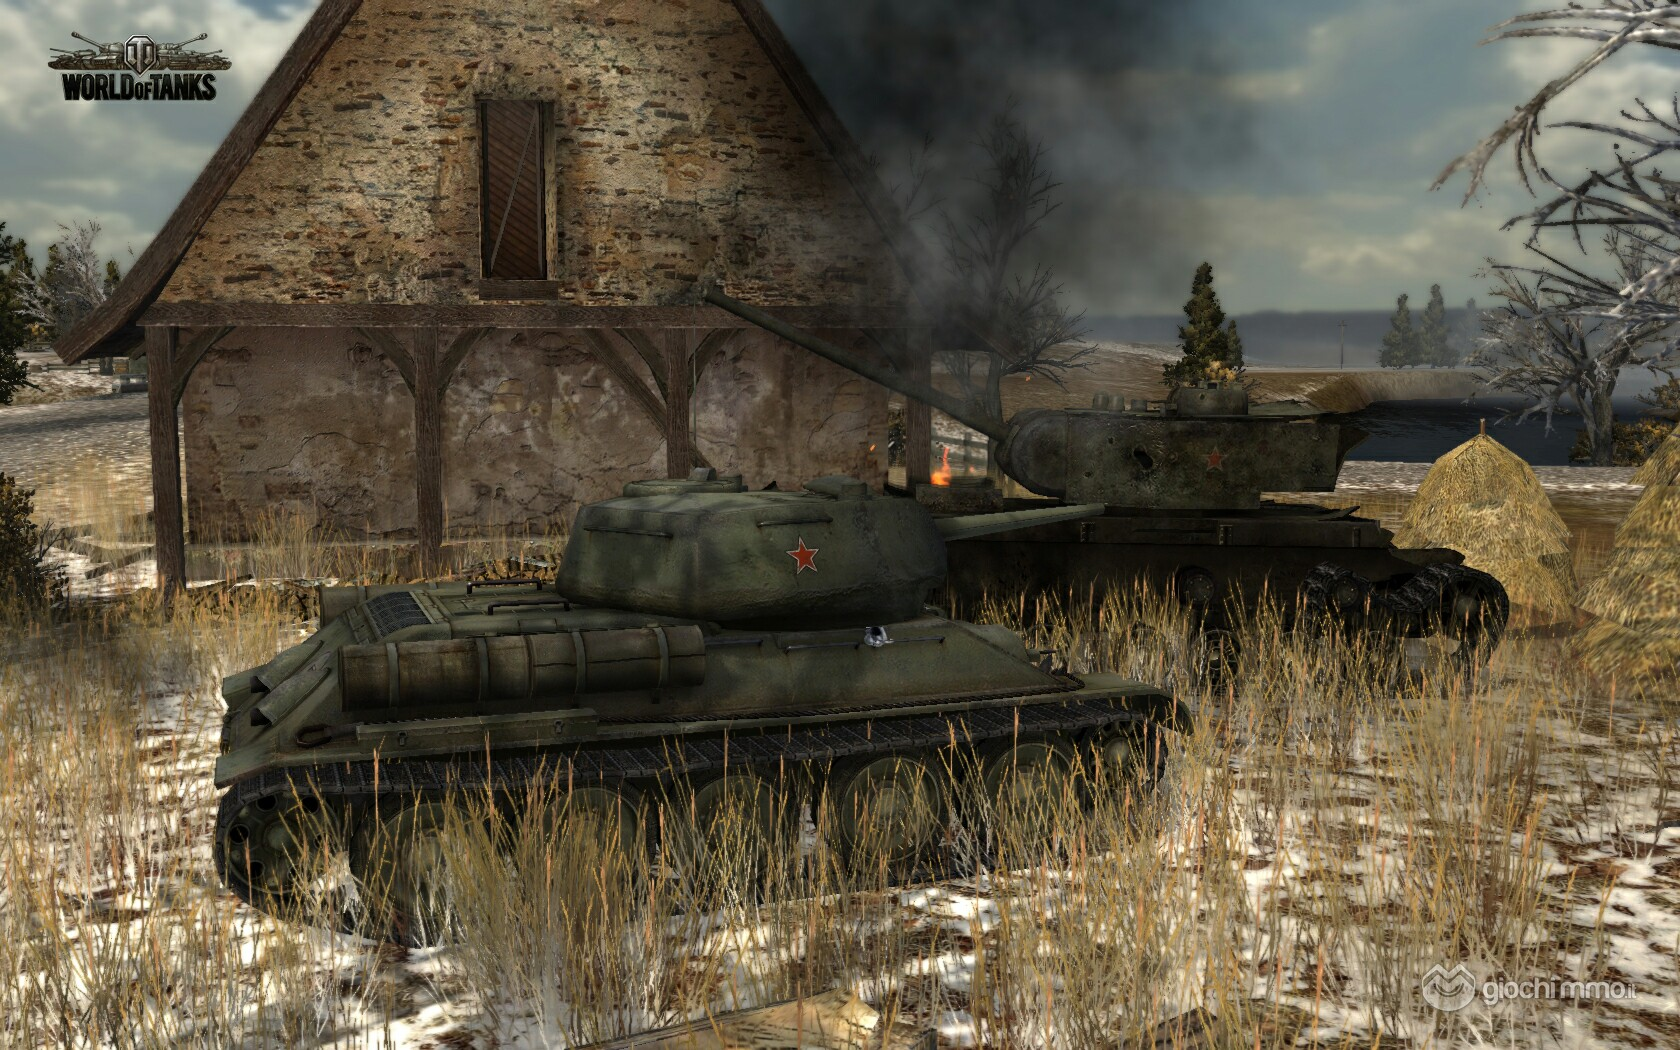 Clicca sull'immagine per ingrandirlaNome:   World of Tanks screen3.jpgVisite: 87Dimensione:   558.9 KBID: 8208